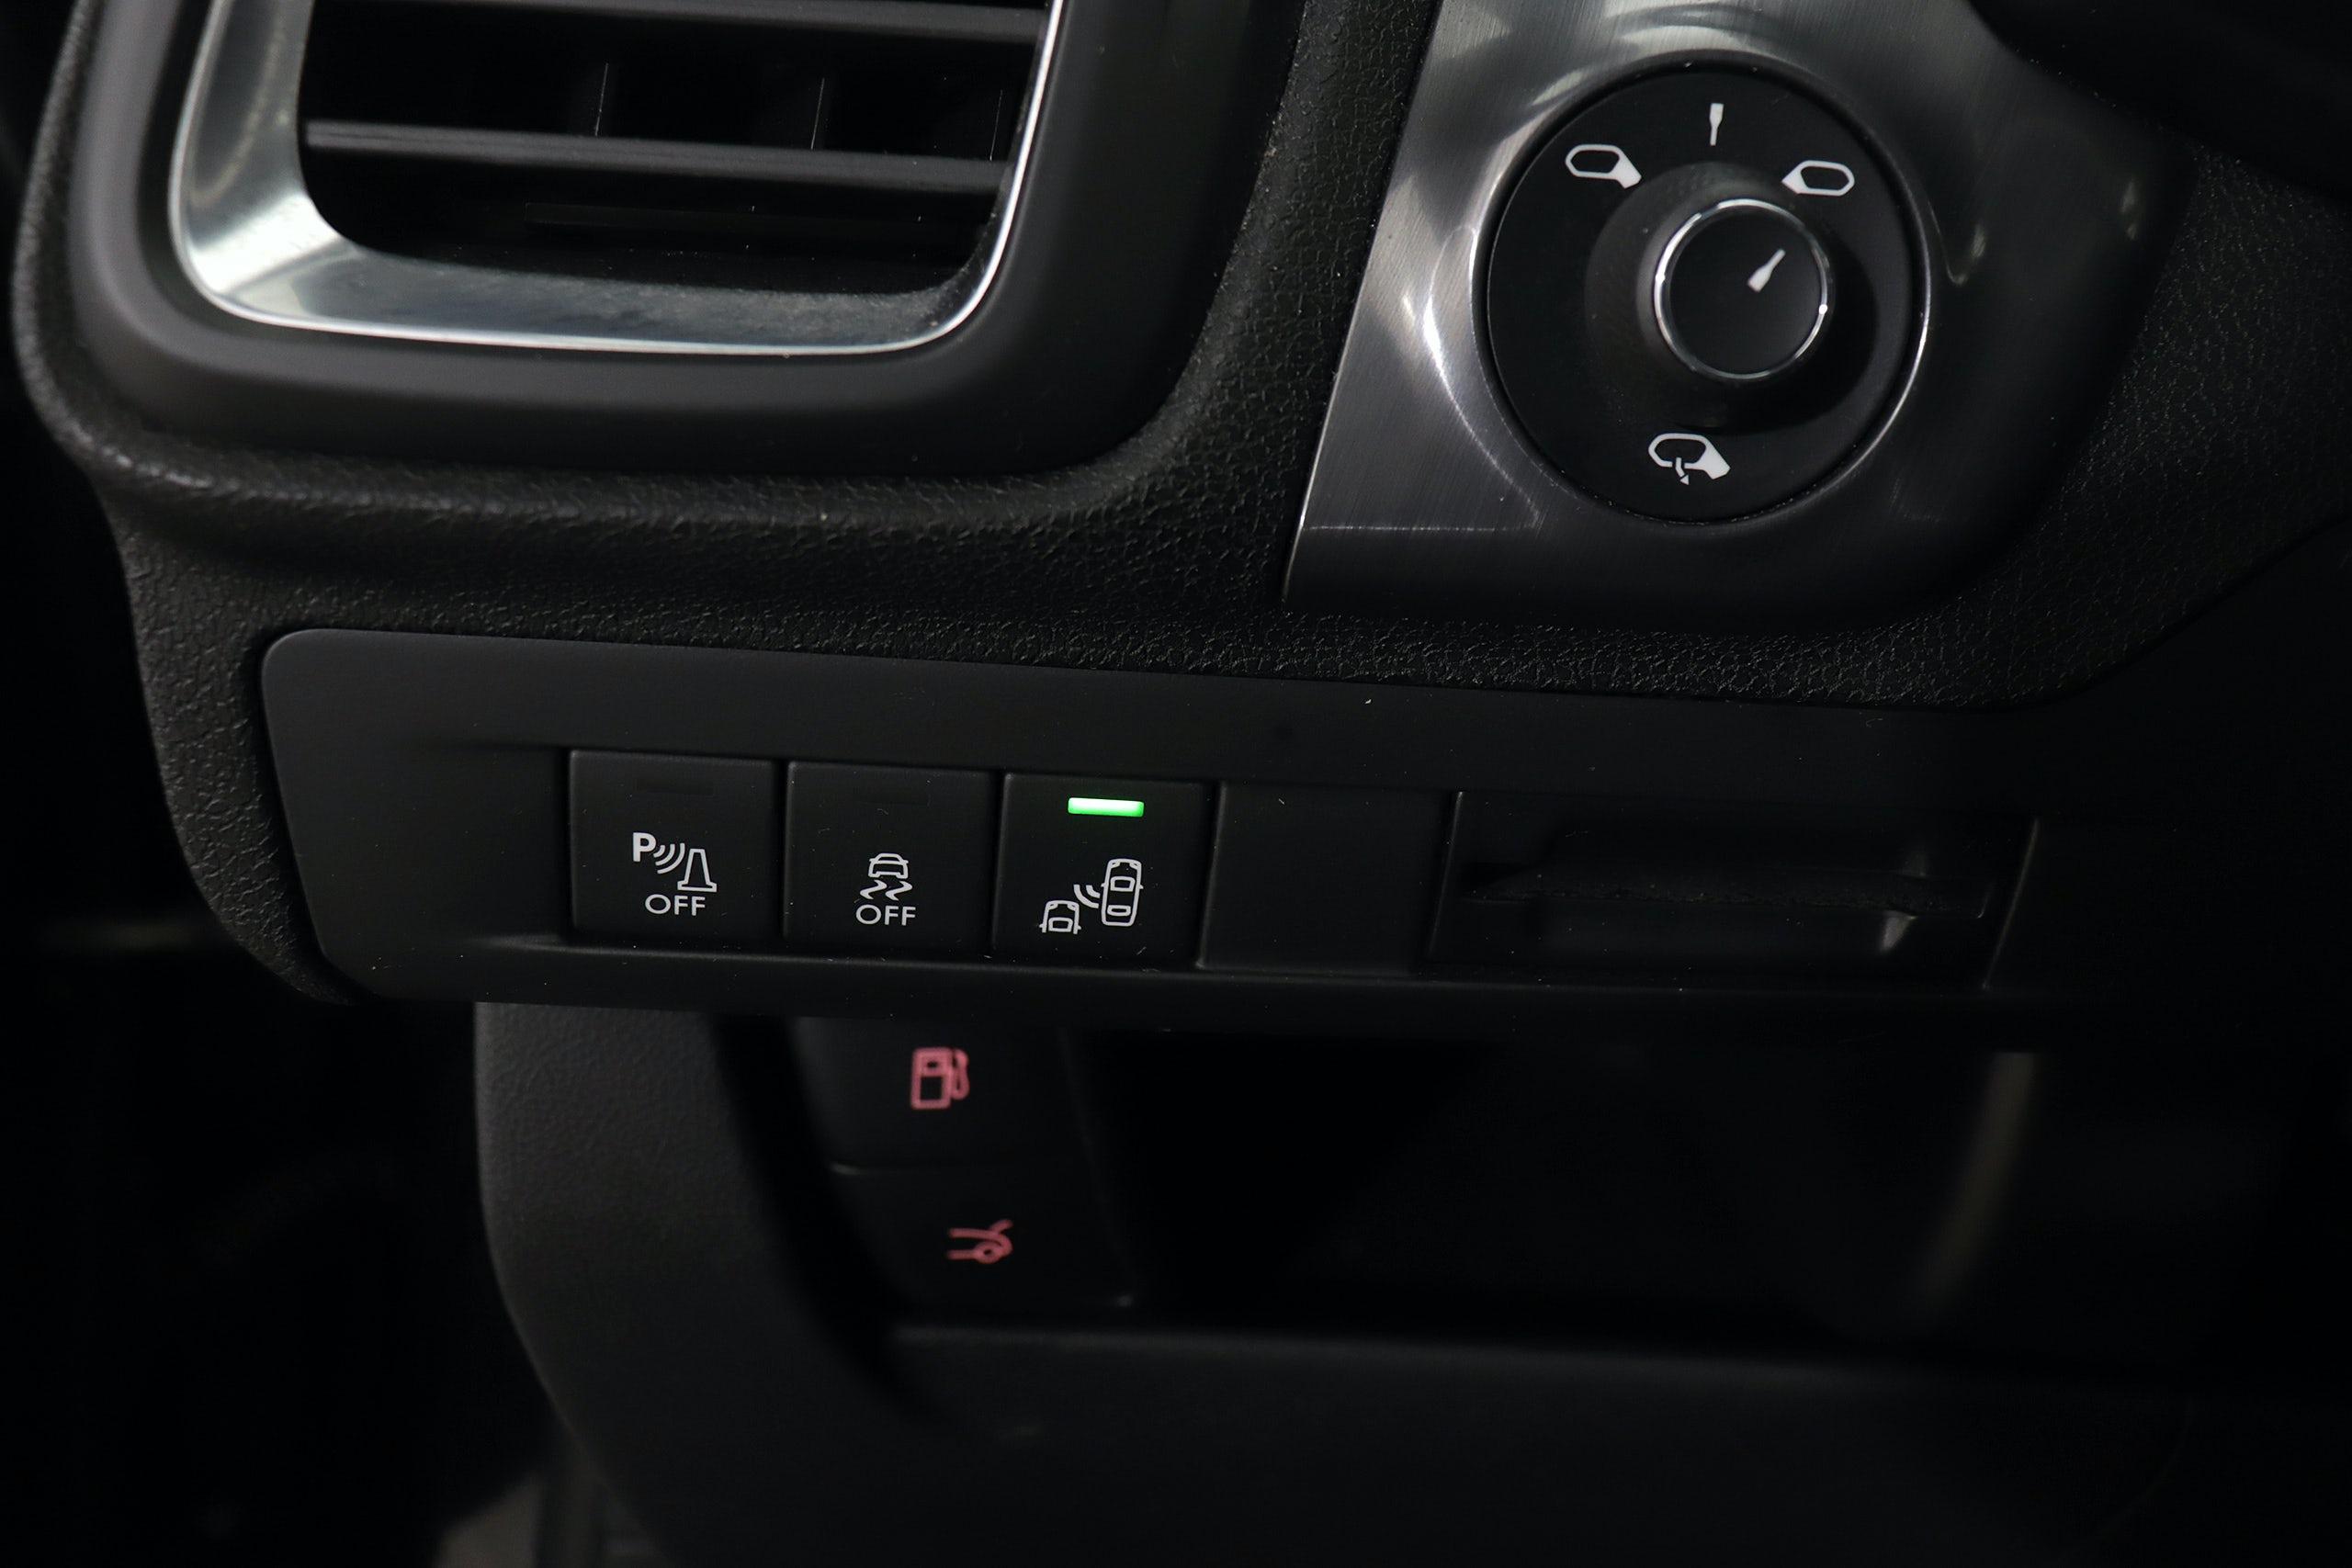 Citroen Ds5 2.0 BlueHDi 180cv Sport 5p Auto - Foto 19